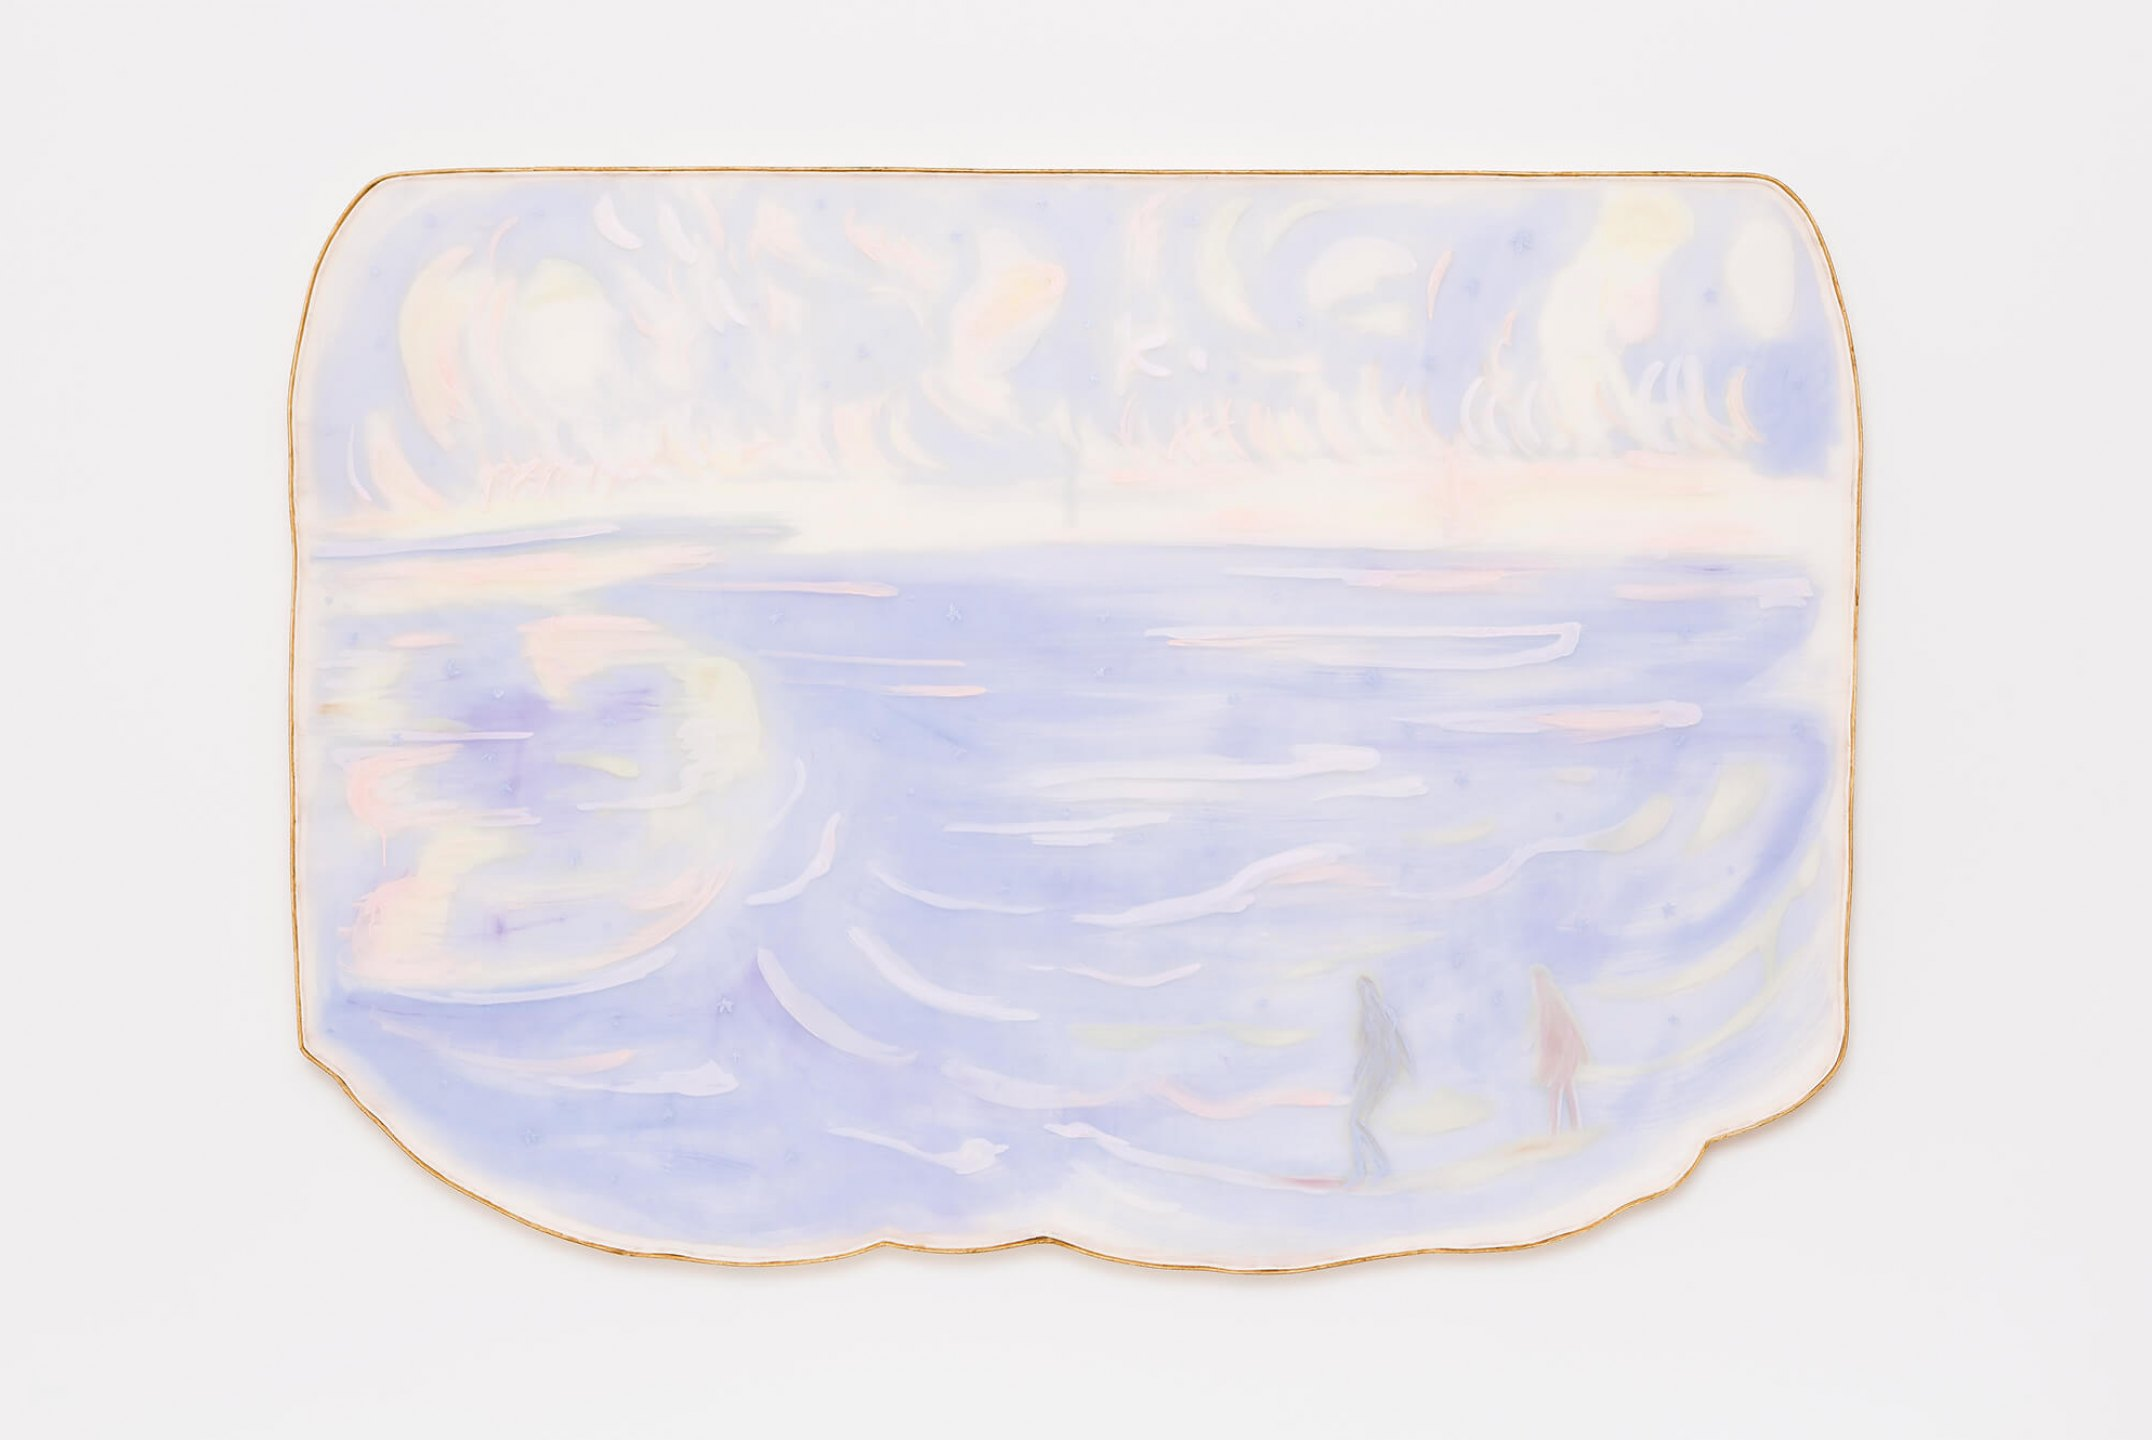 Marina Perez Simão, <em>Untitled</em>, 2015,&nbsp;acrylic and iridescent pigment on polyester paper assembled on wood,&nbsp;152,5&nbsp;×&nbsp;217 × 5 cm&nbsp; - Mendes Wood DM